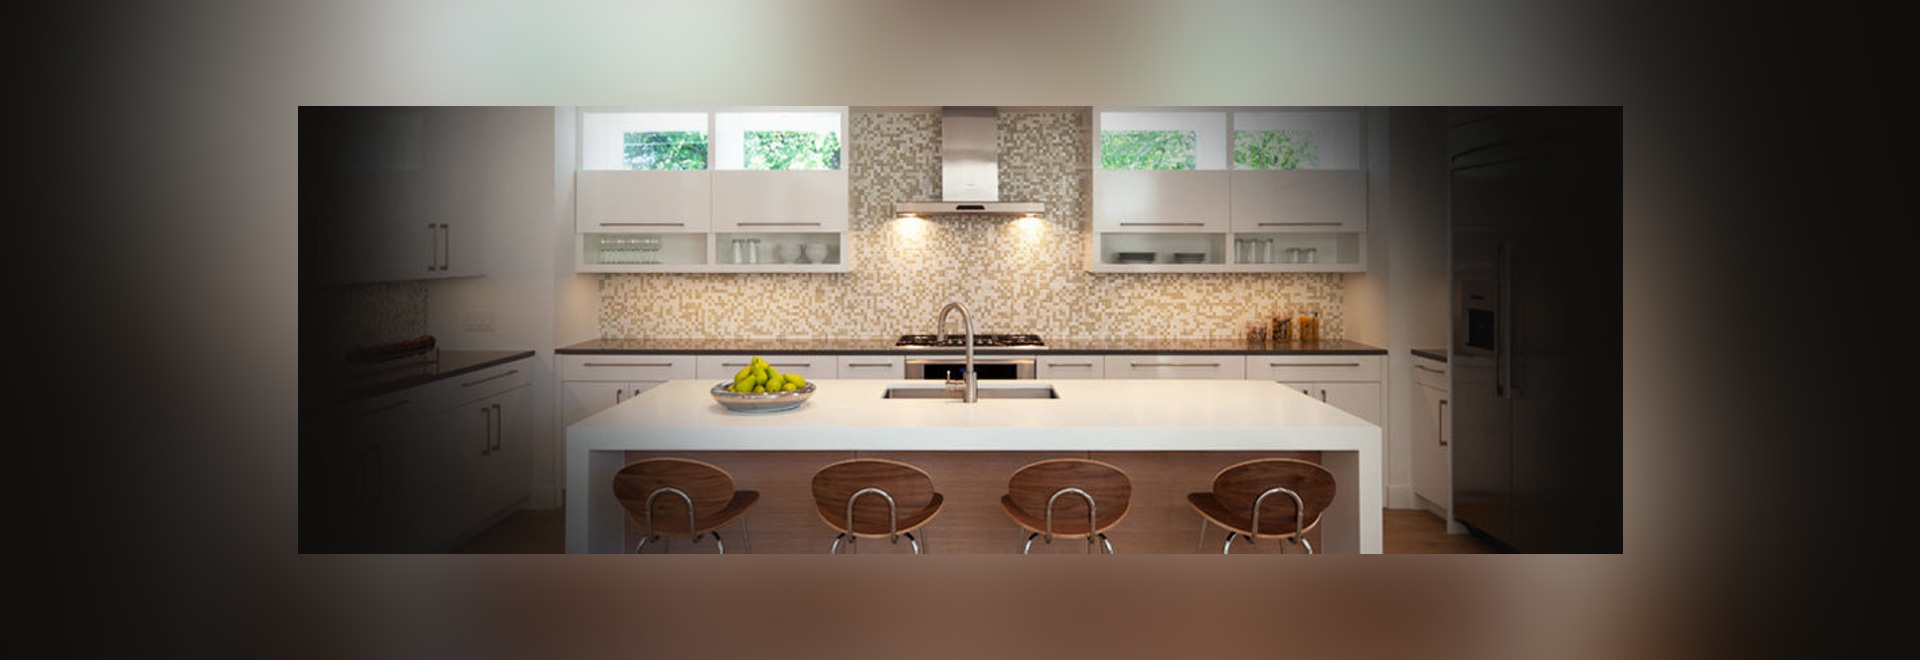 NOVITÀ: mosaico da cucina by Trend Group S.p.A. - Trend